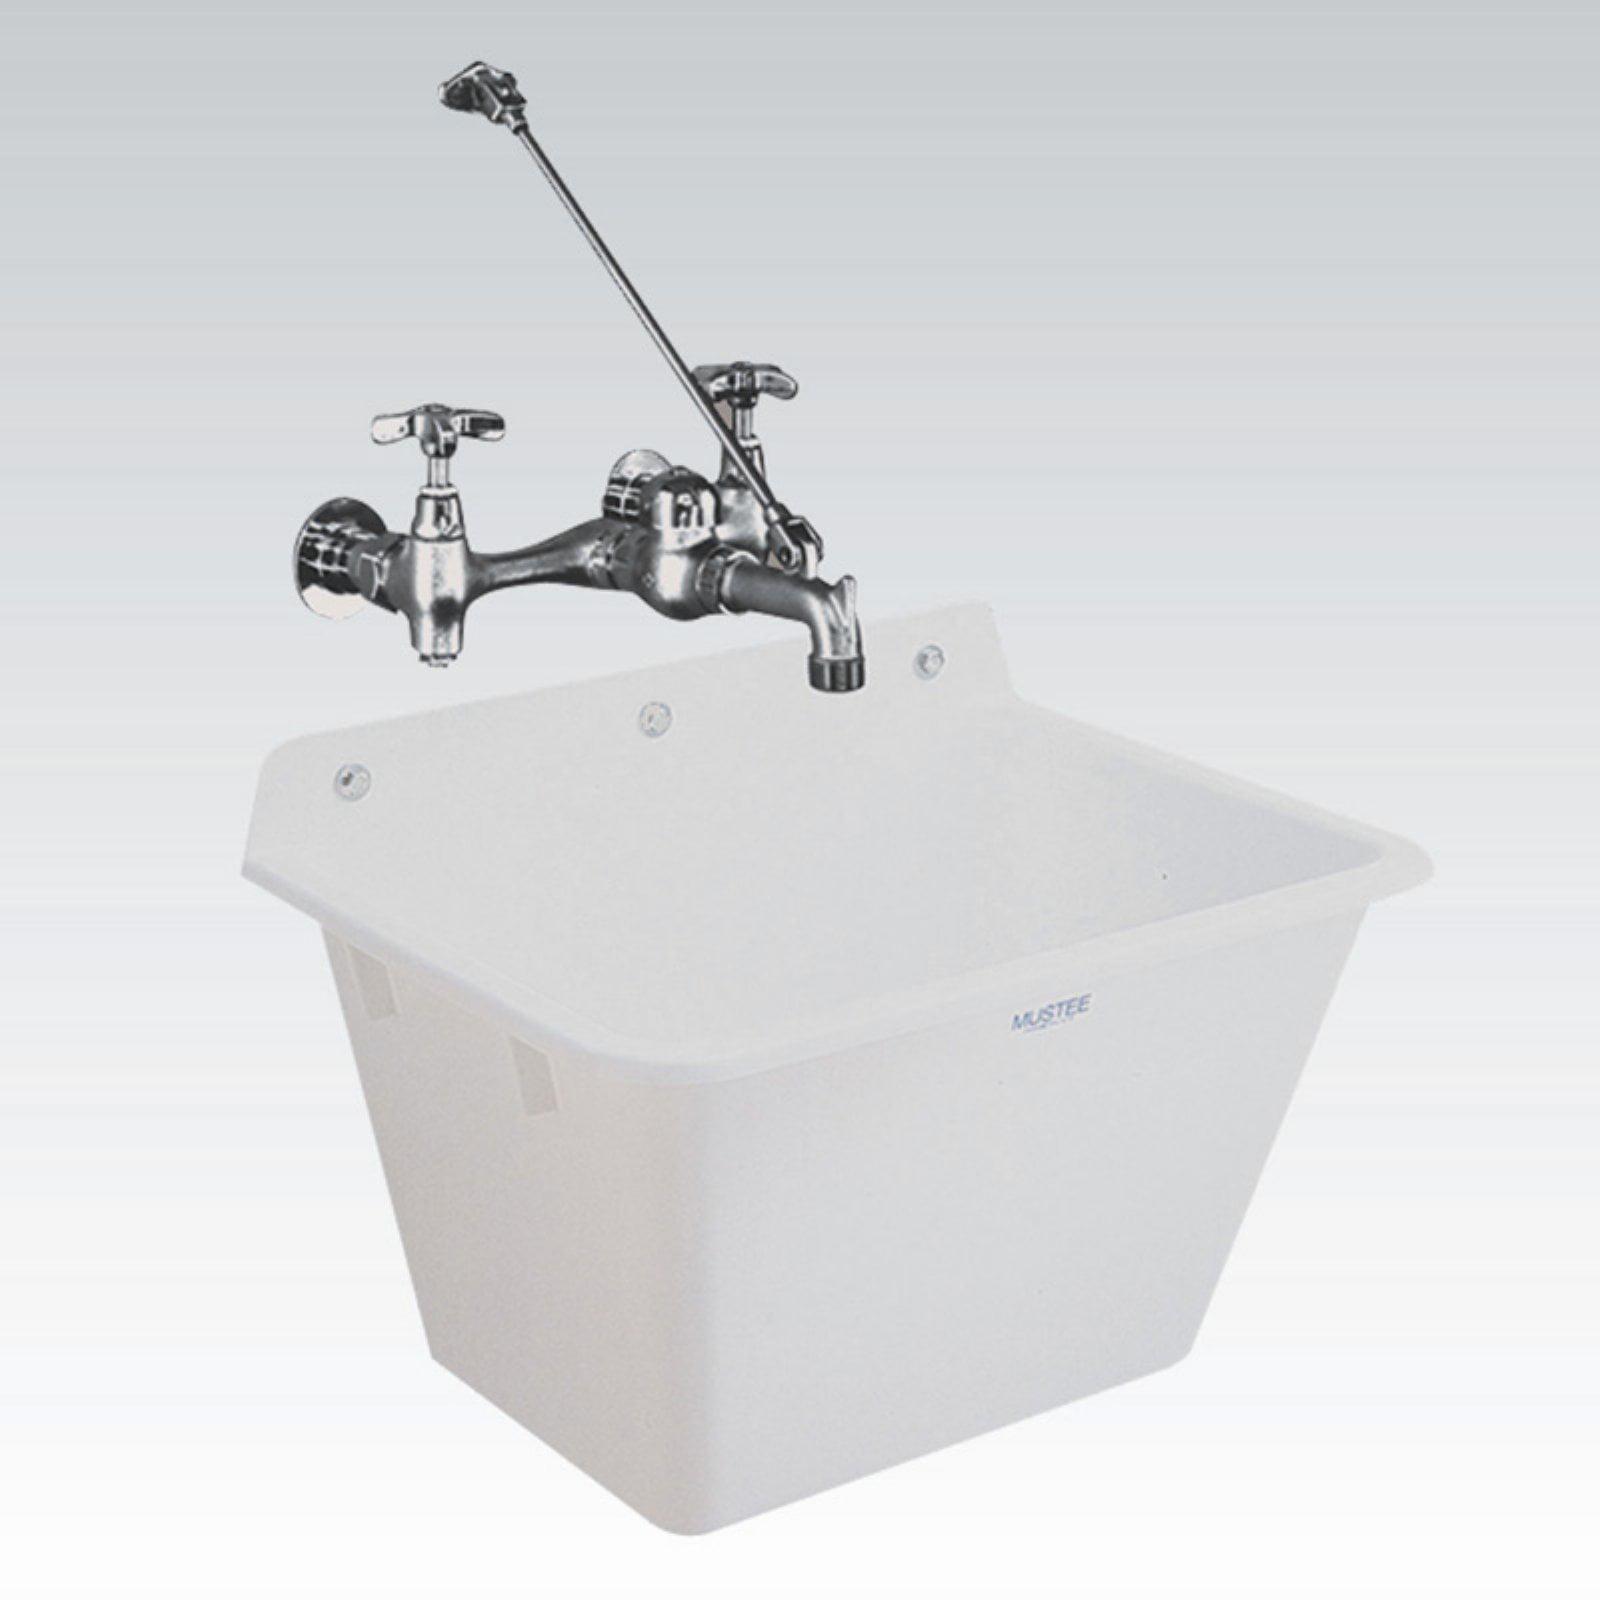 Mustee Utilatub 16 Single Basin Wall Mount Utility Sink